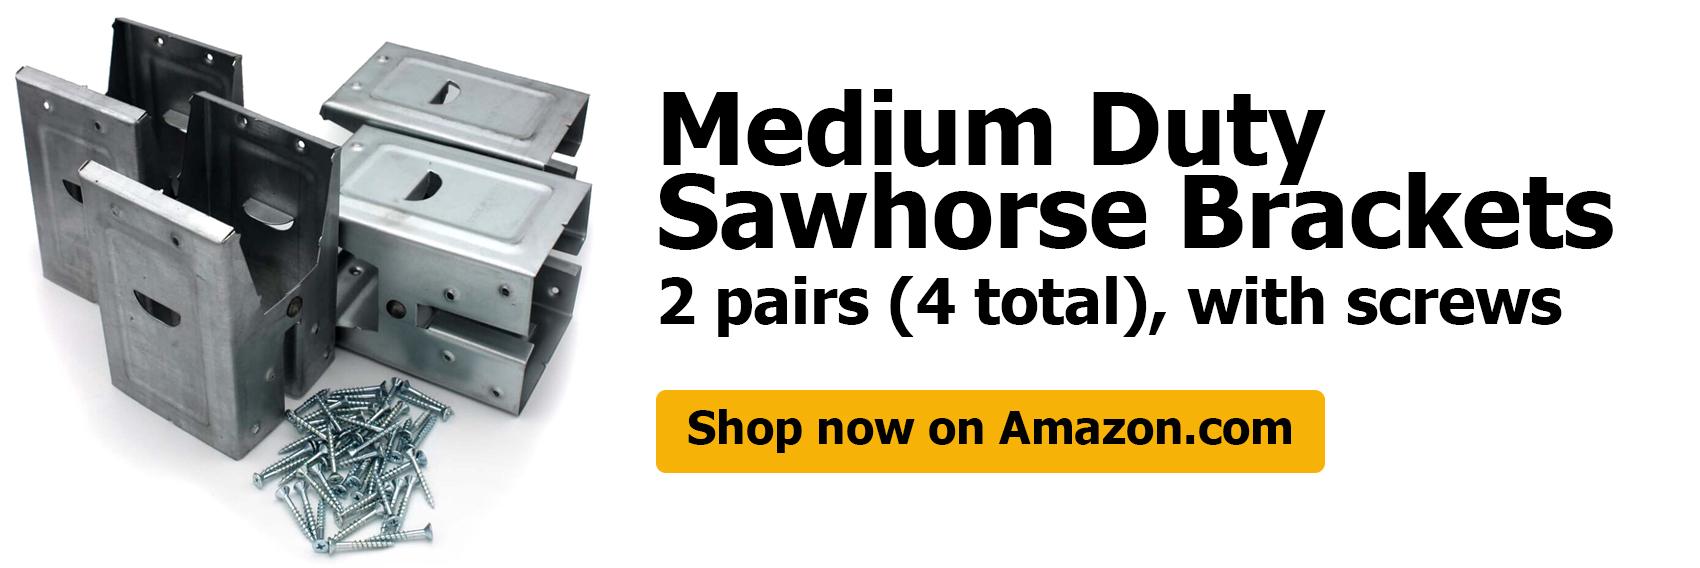 medium_duty_sawhorse_brackets_galvanized_2_pairs_4_total_with_screws_shop_buy_on_amazondotcom